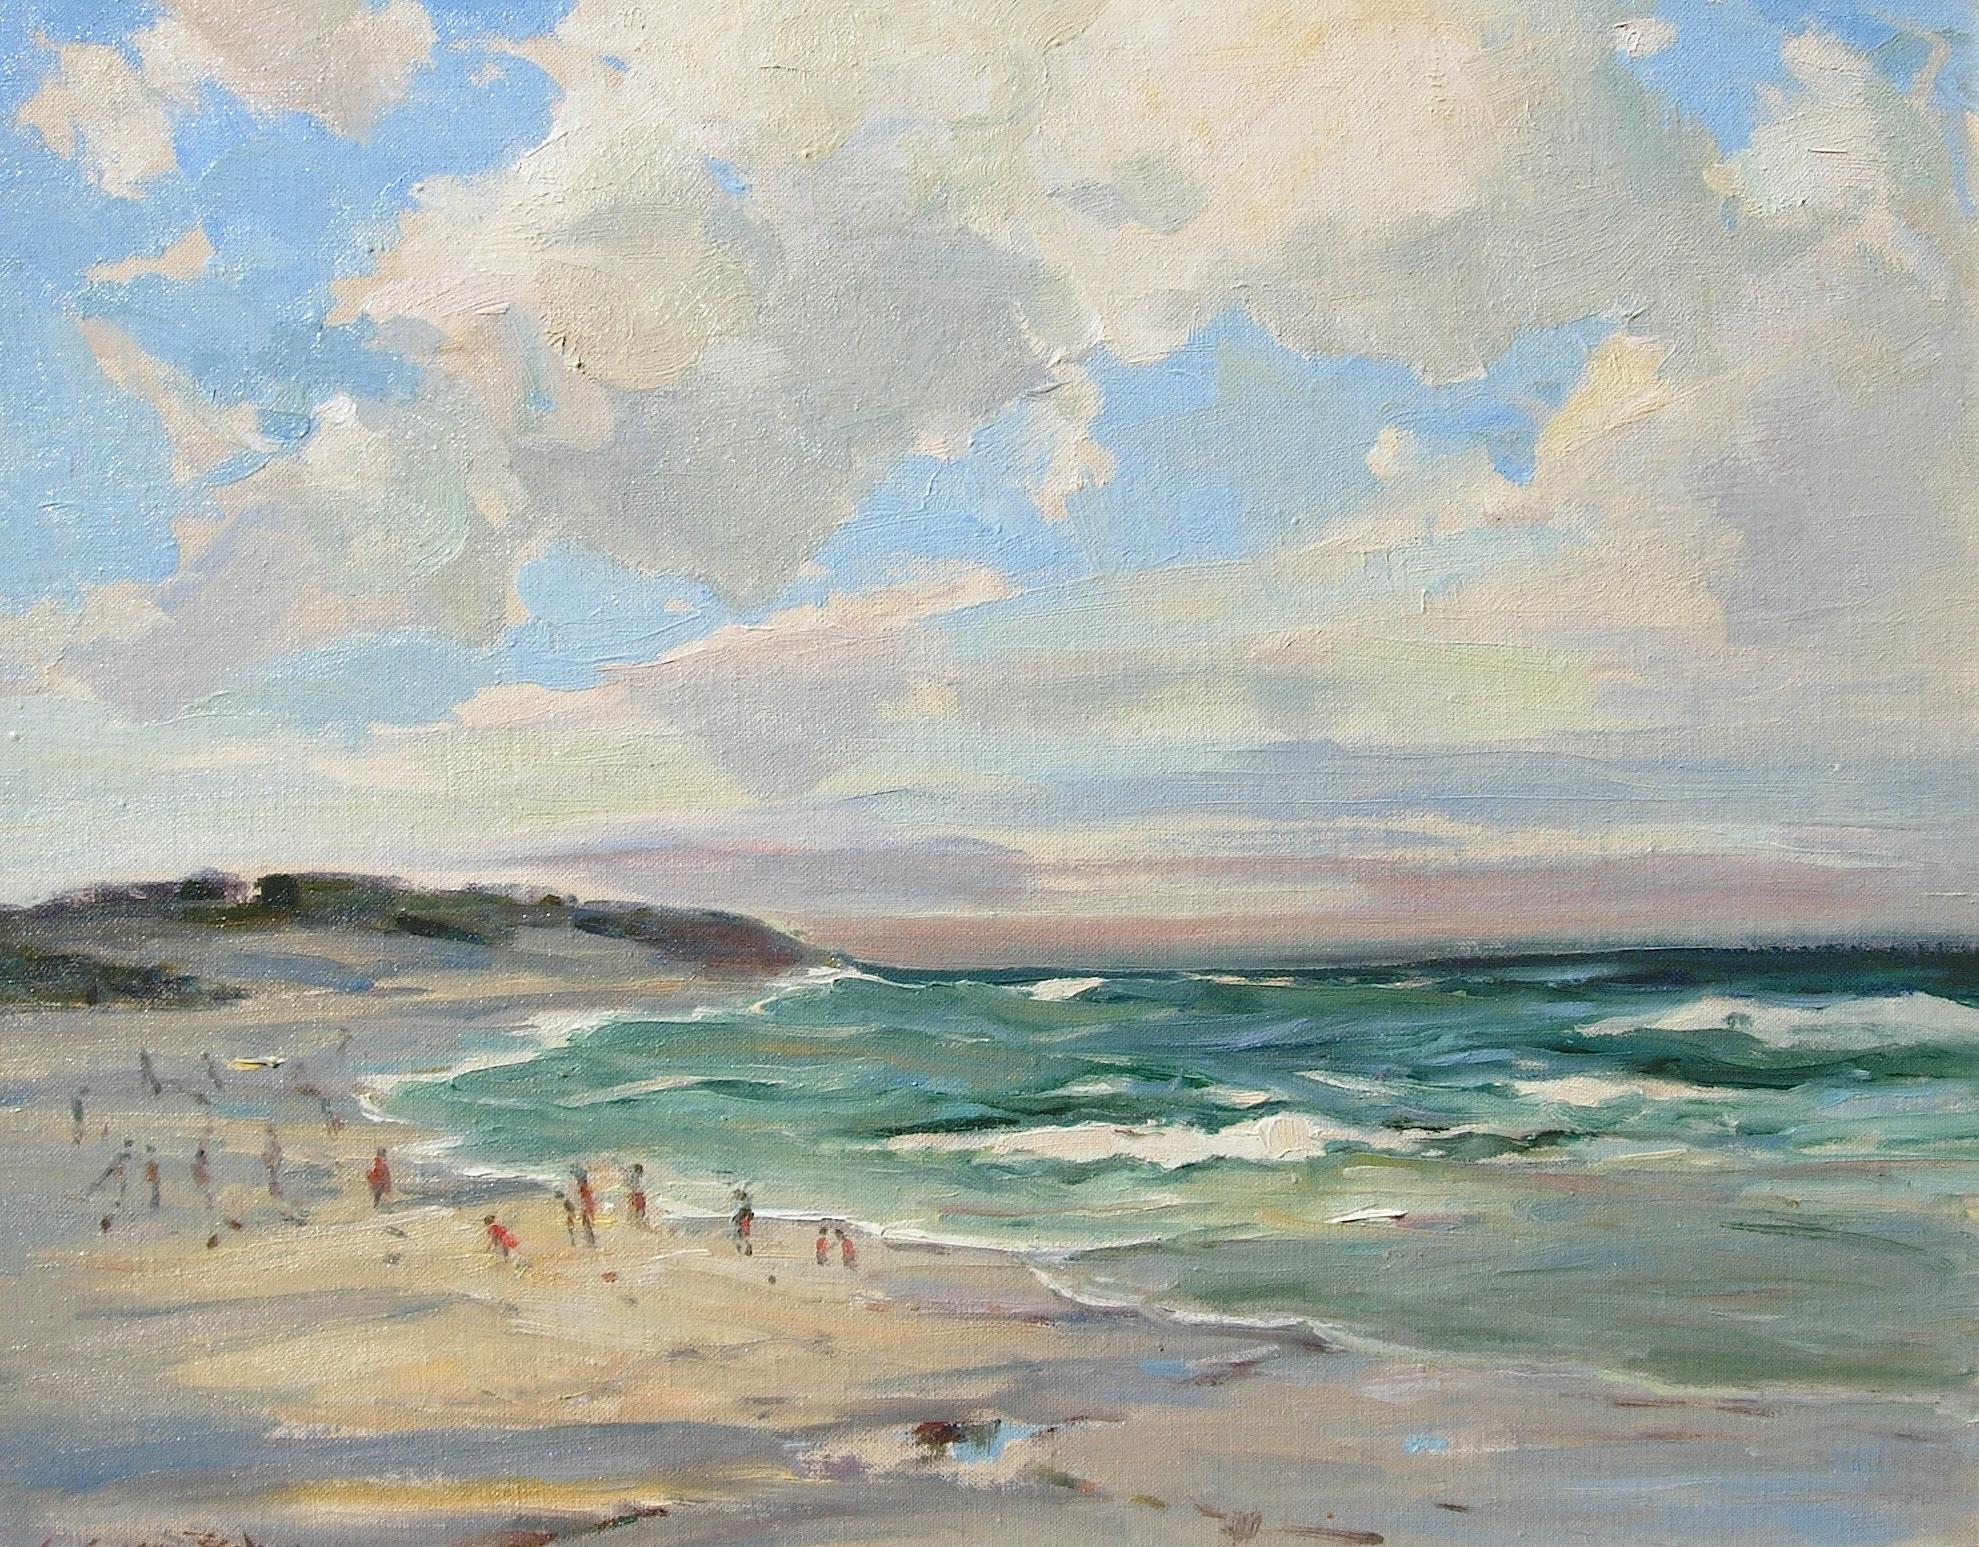 bohm-beach-cropped